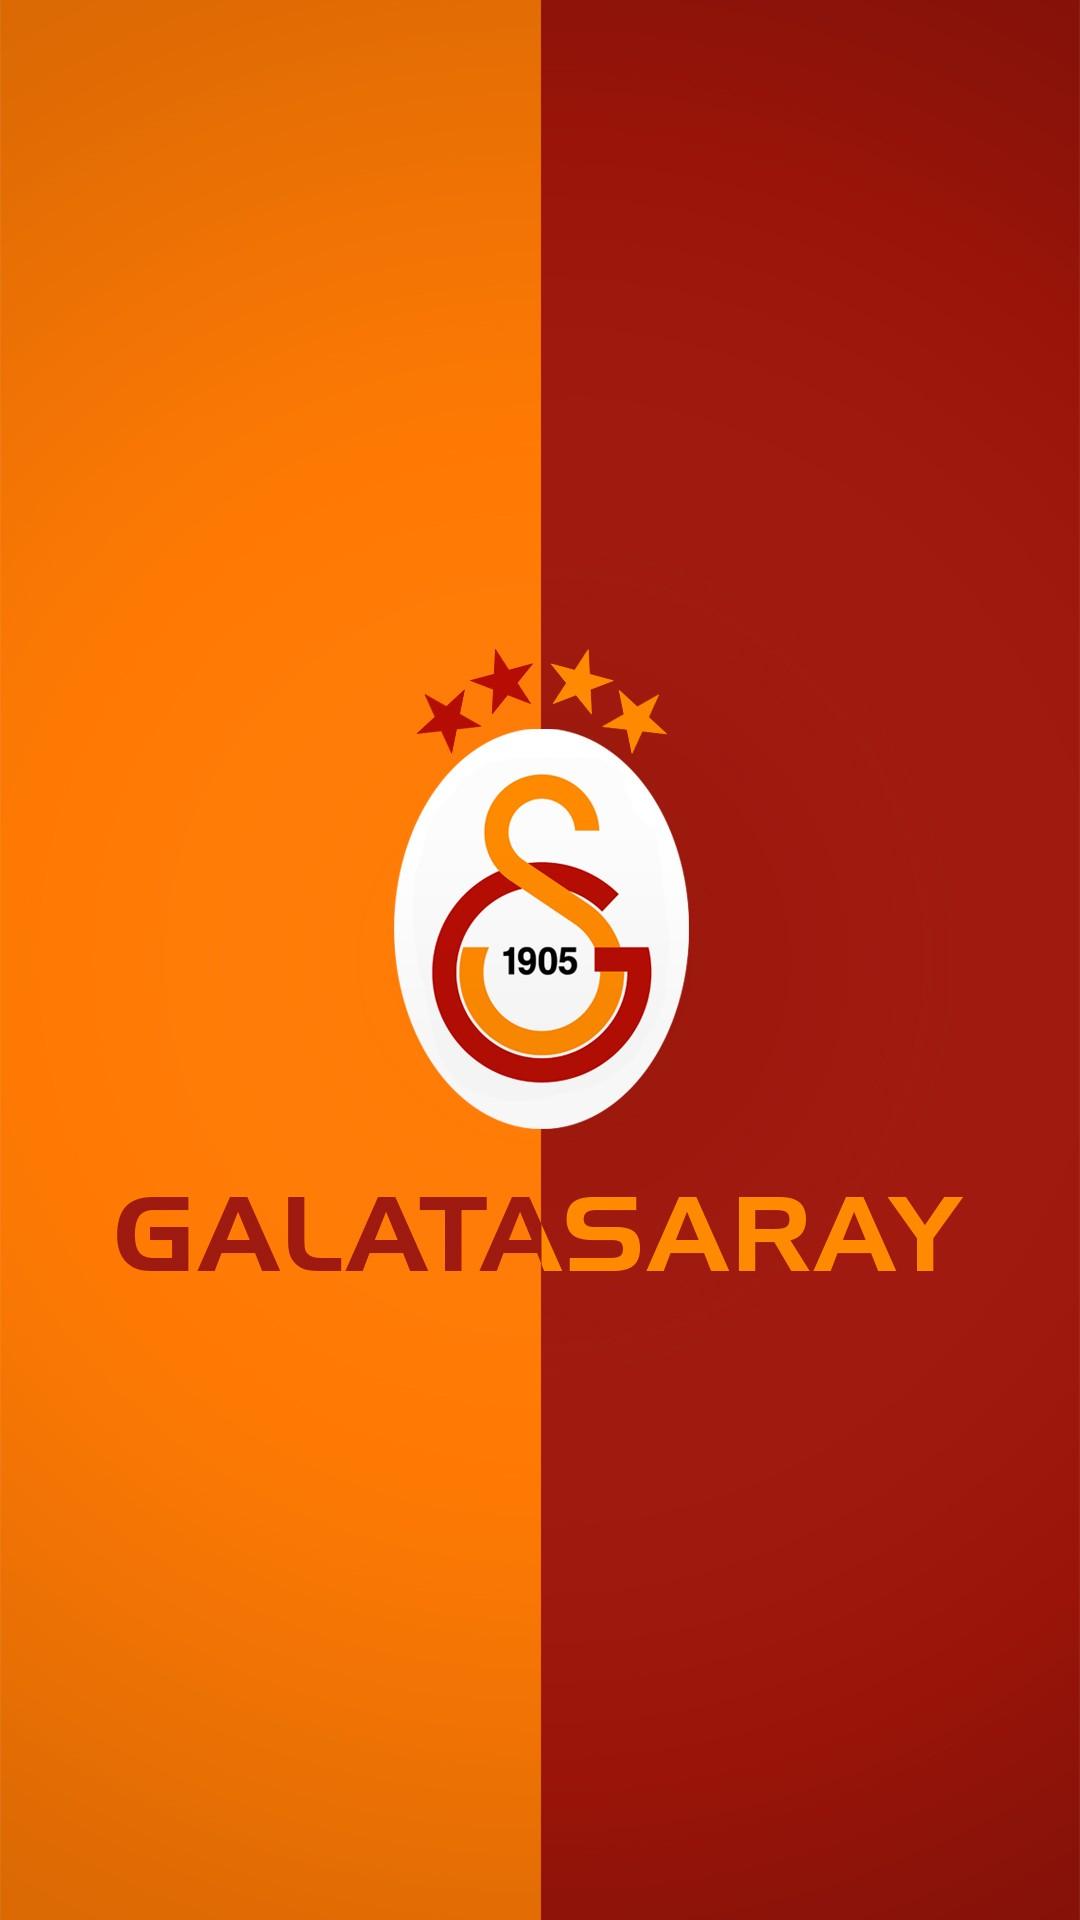 Soccer Iphone X Wallpaper Galatasaray S K Soccer Wallpapers Hd Desktop And